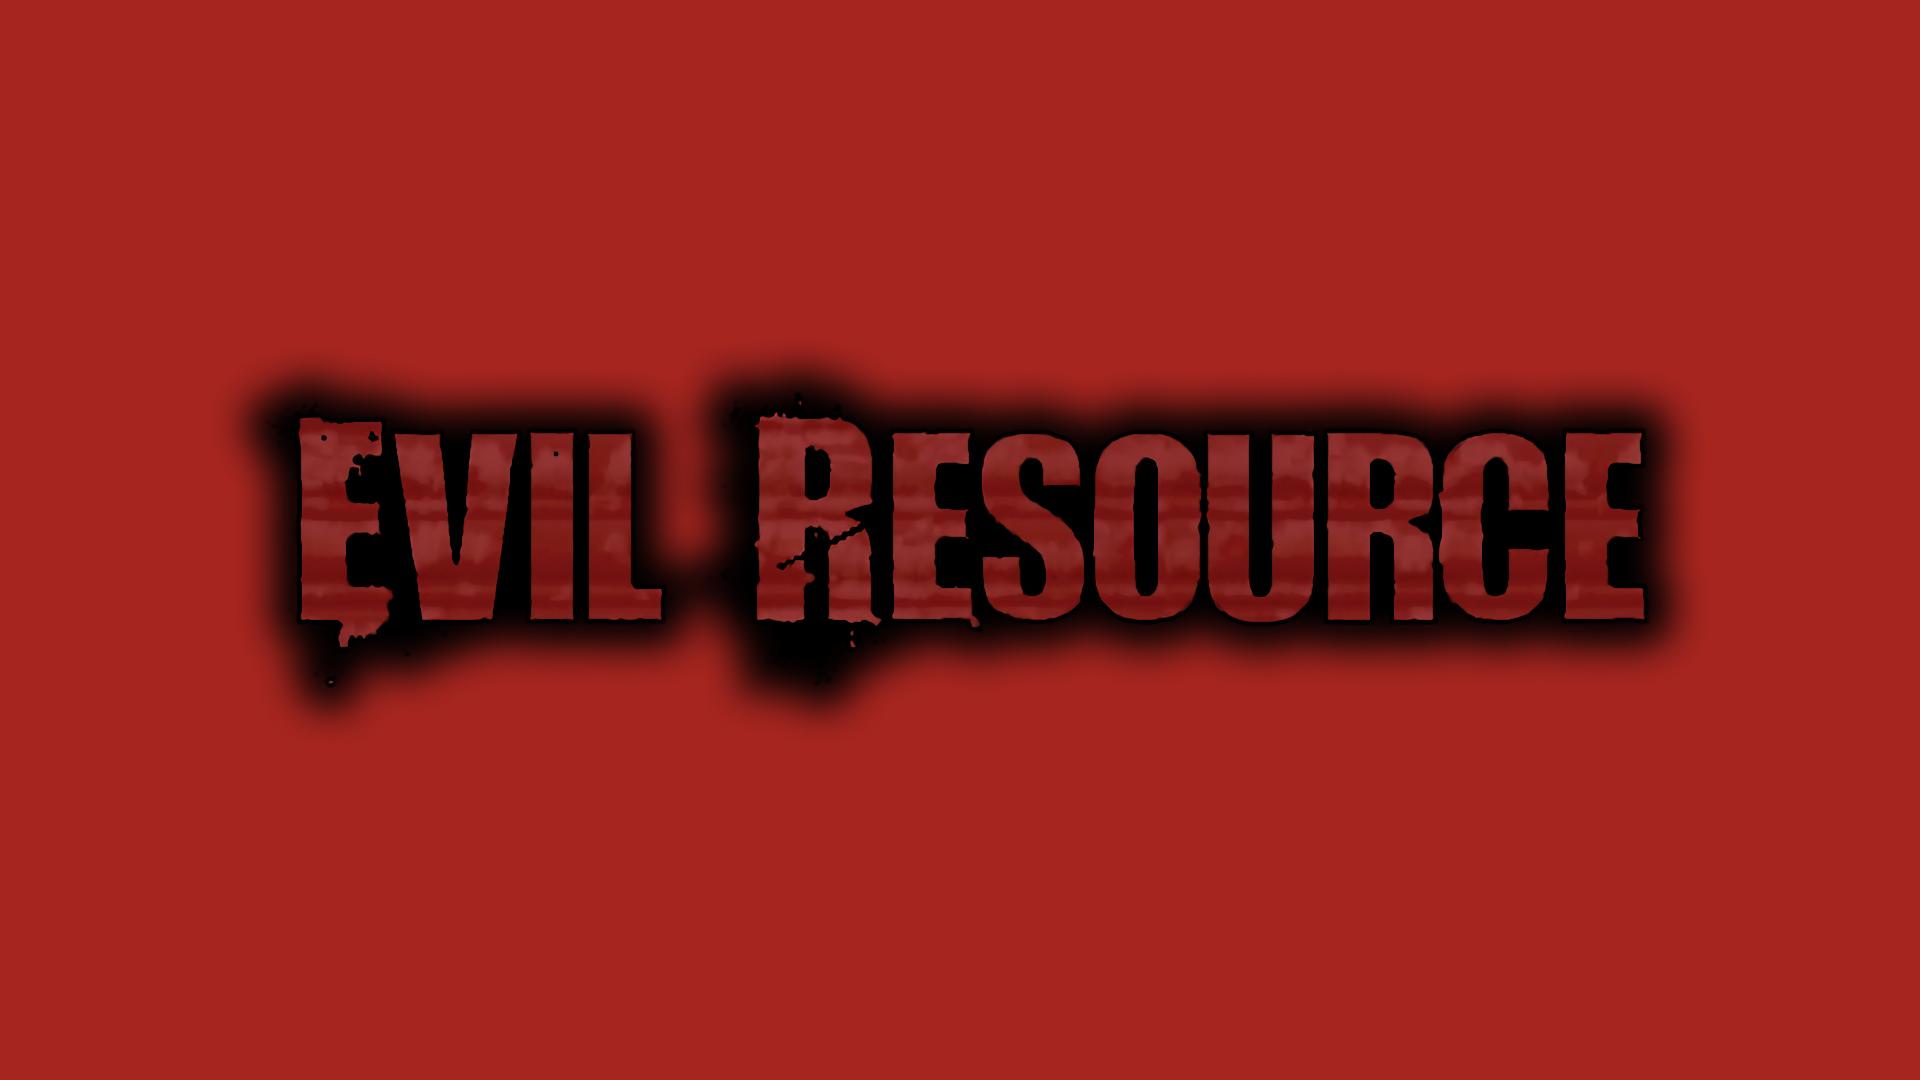 evil-resource